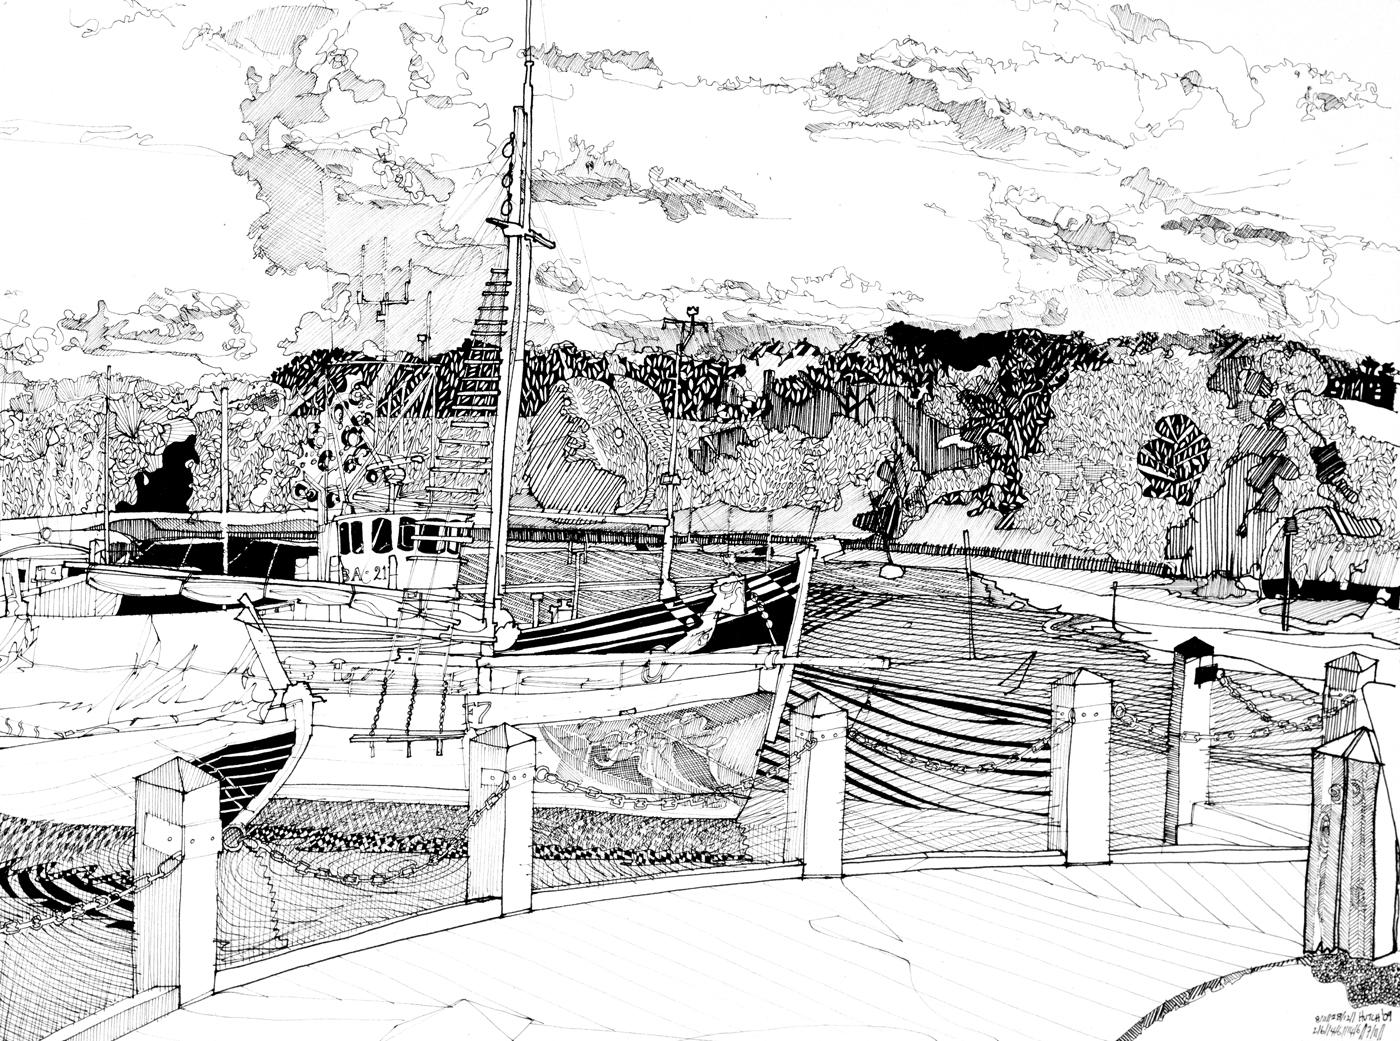 Woodbridge Harbour; Low Tide, High Contrast, Lightfast pen on paper, James Hutchinson